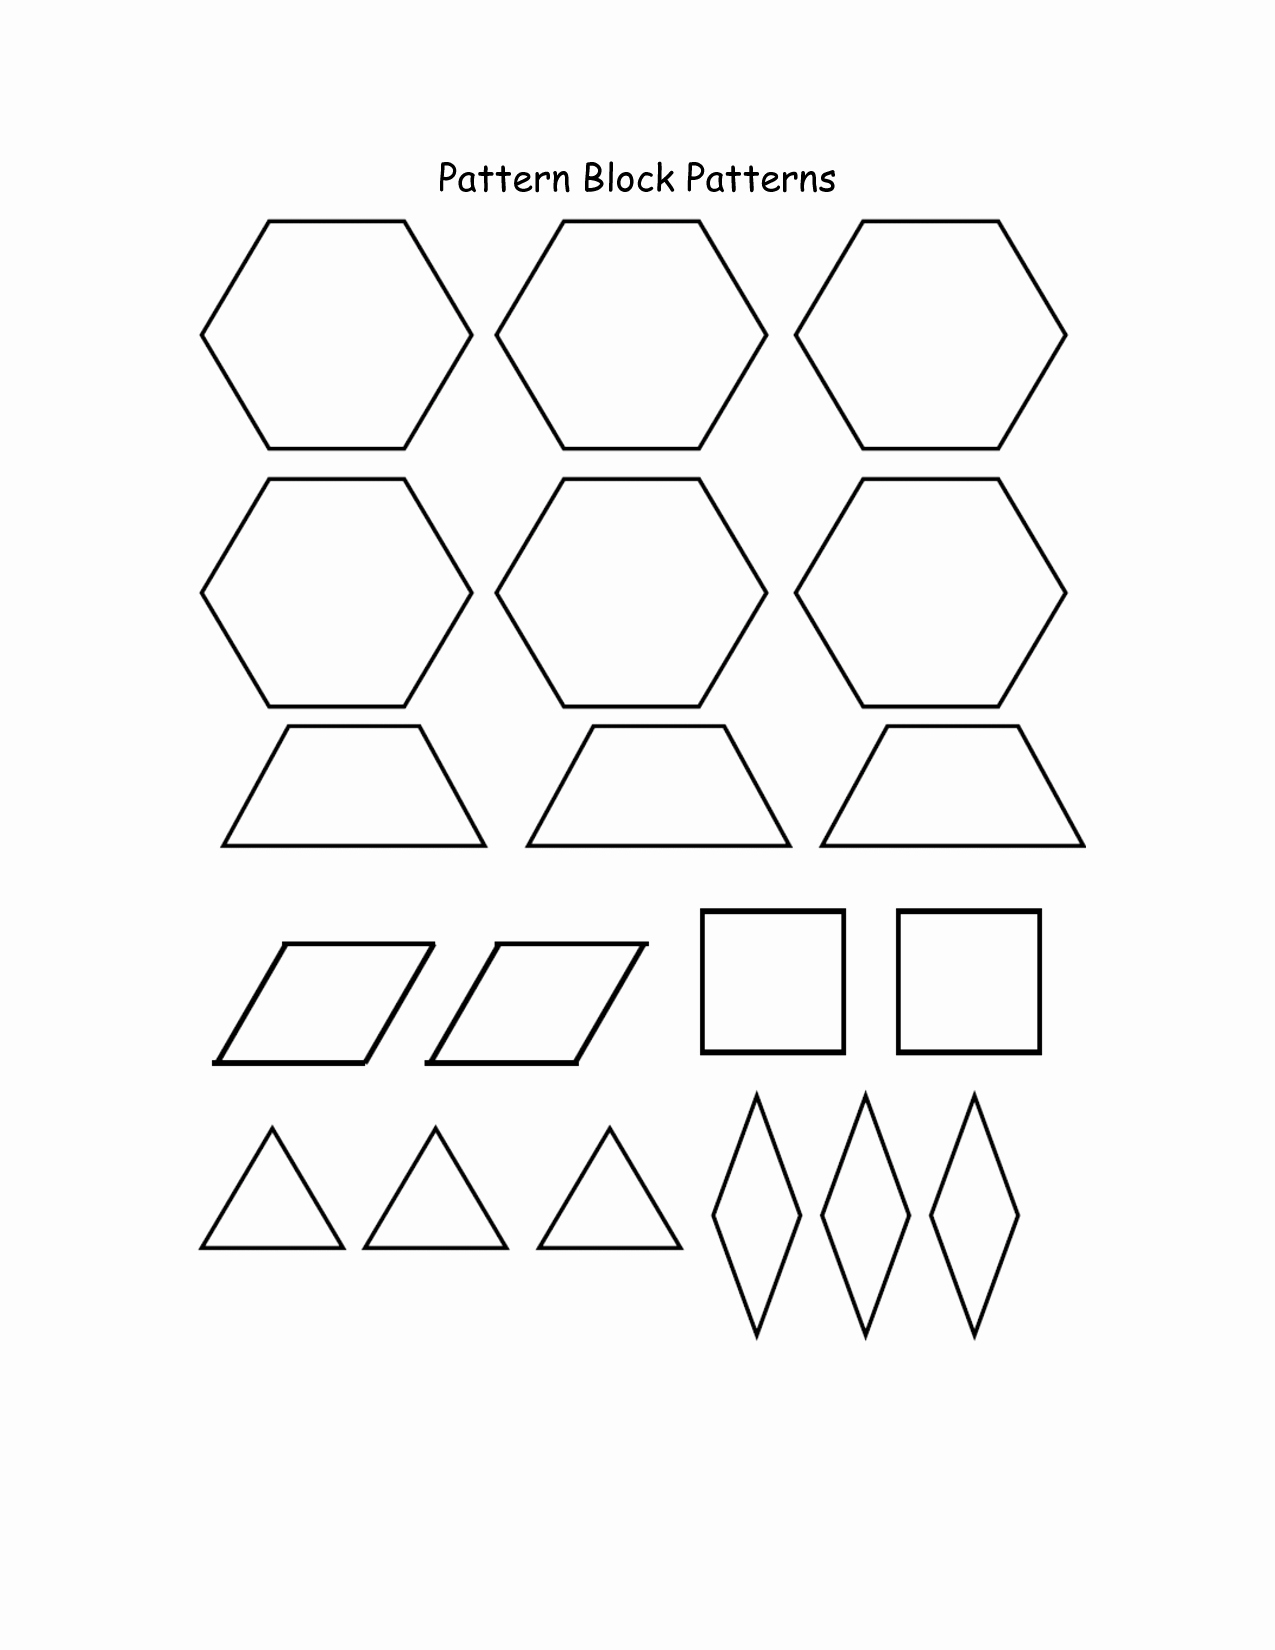 Pattern Block Templates Pdf Elegant Pattern Block Templates